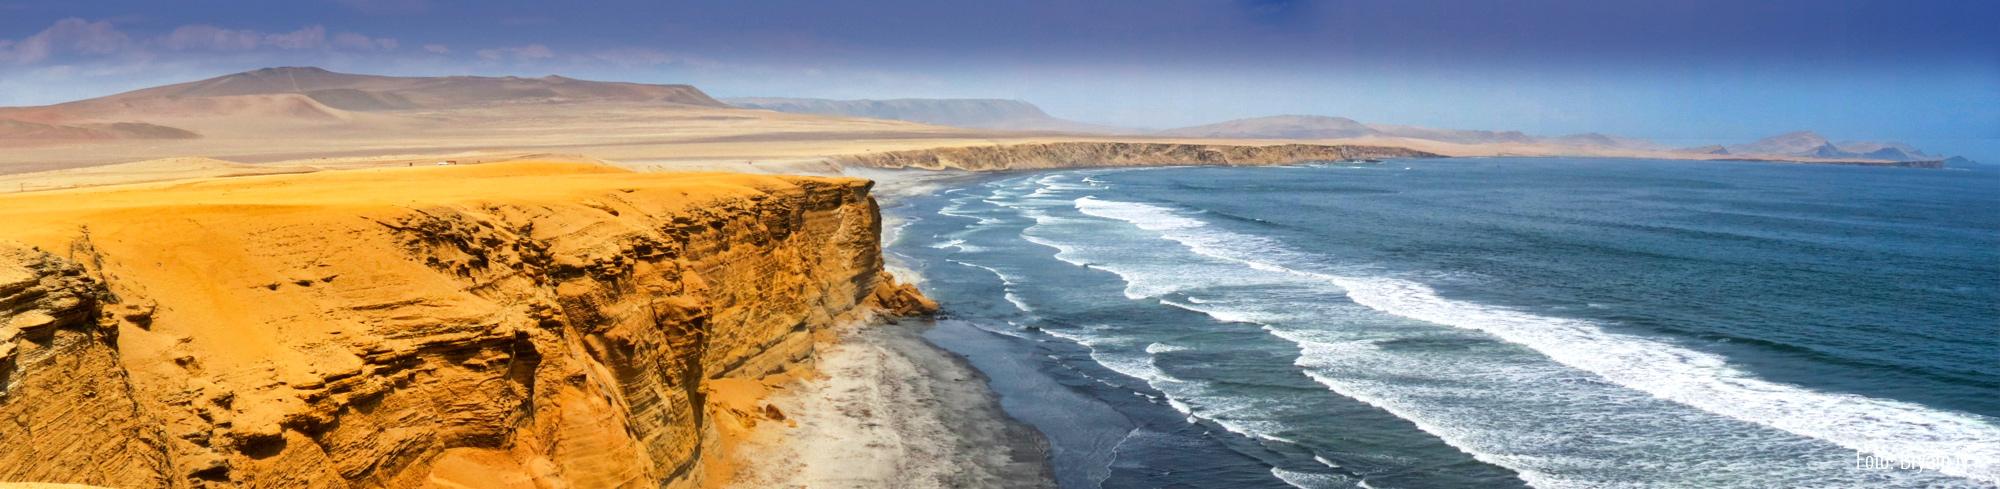 Tour Reserva Nacional de Paracas desde Chincha